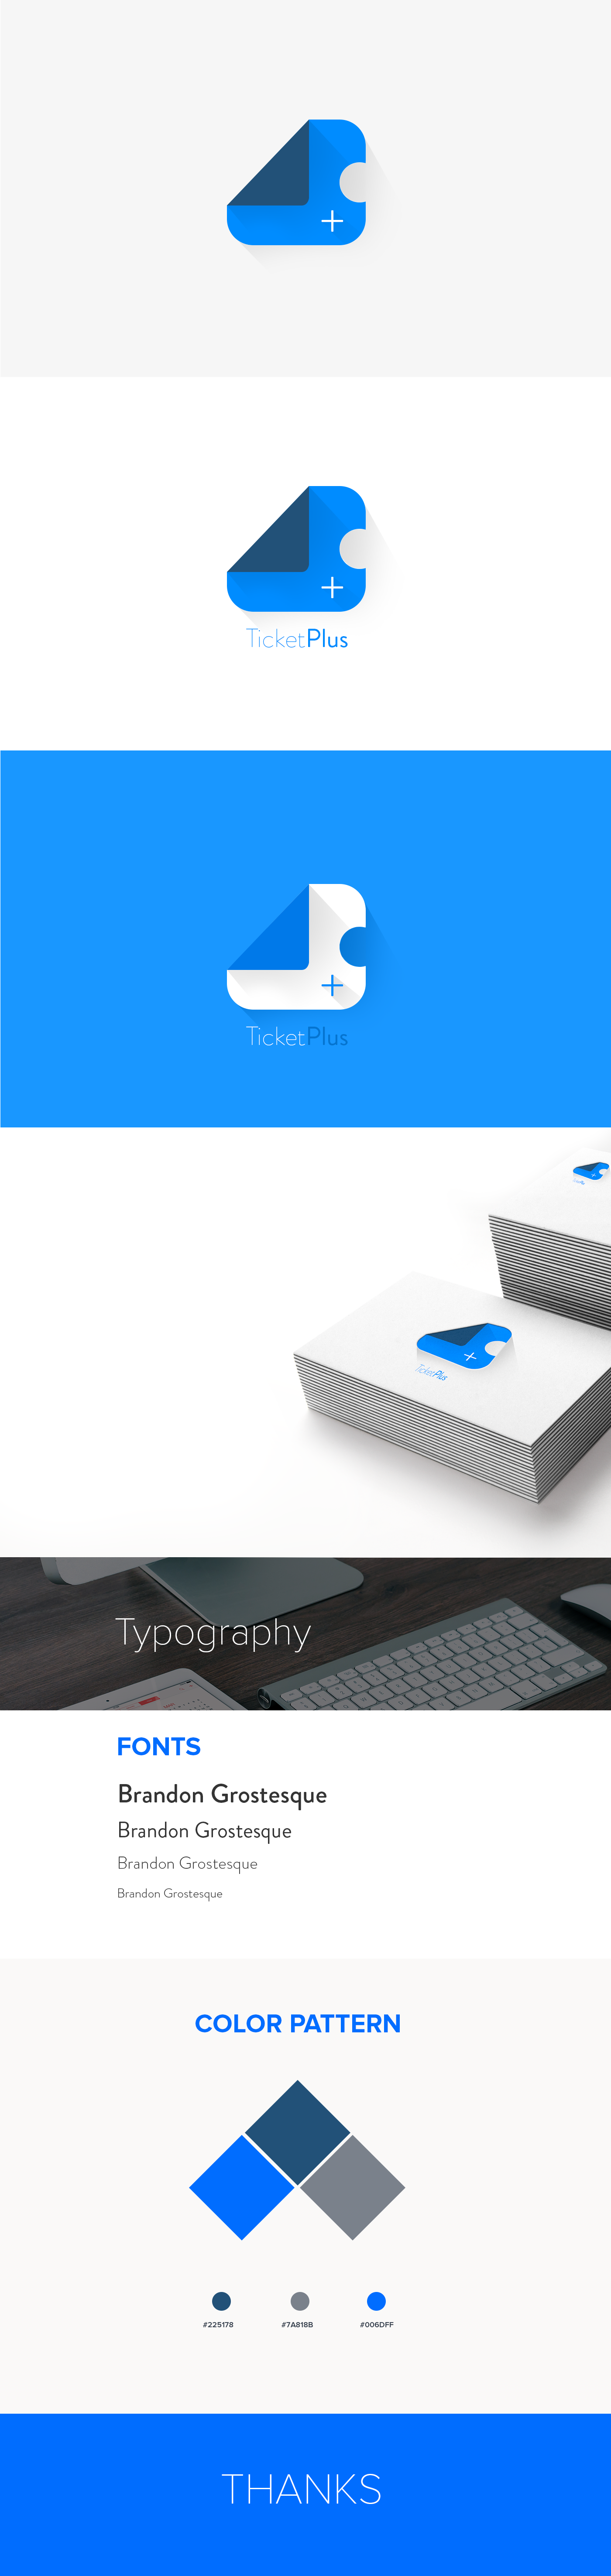 UI ux logo flatui flatdesign blue White longshadow font Tyography color pattern